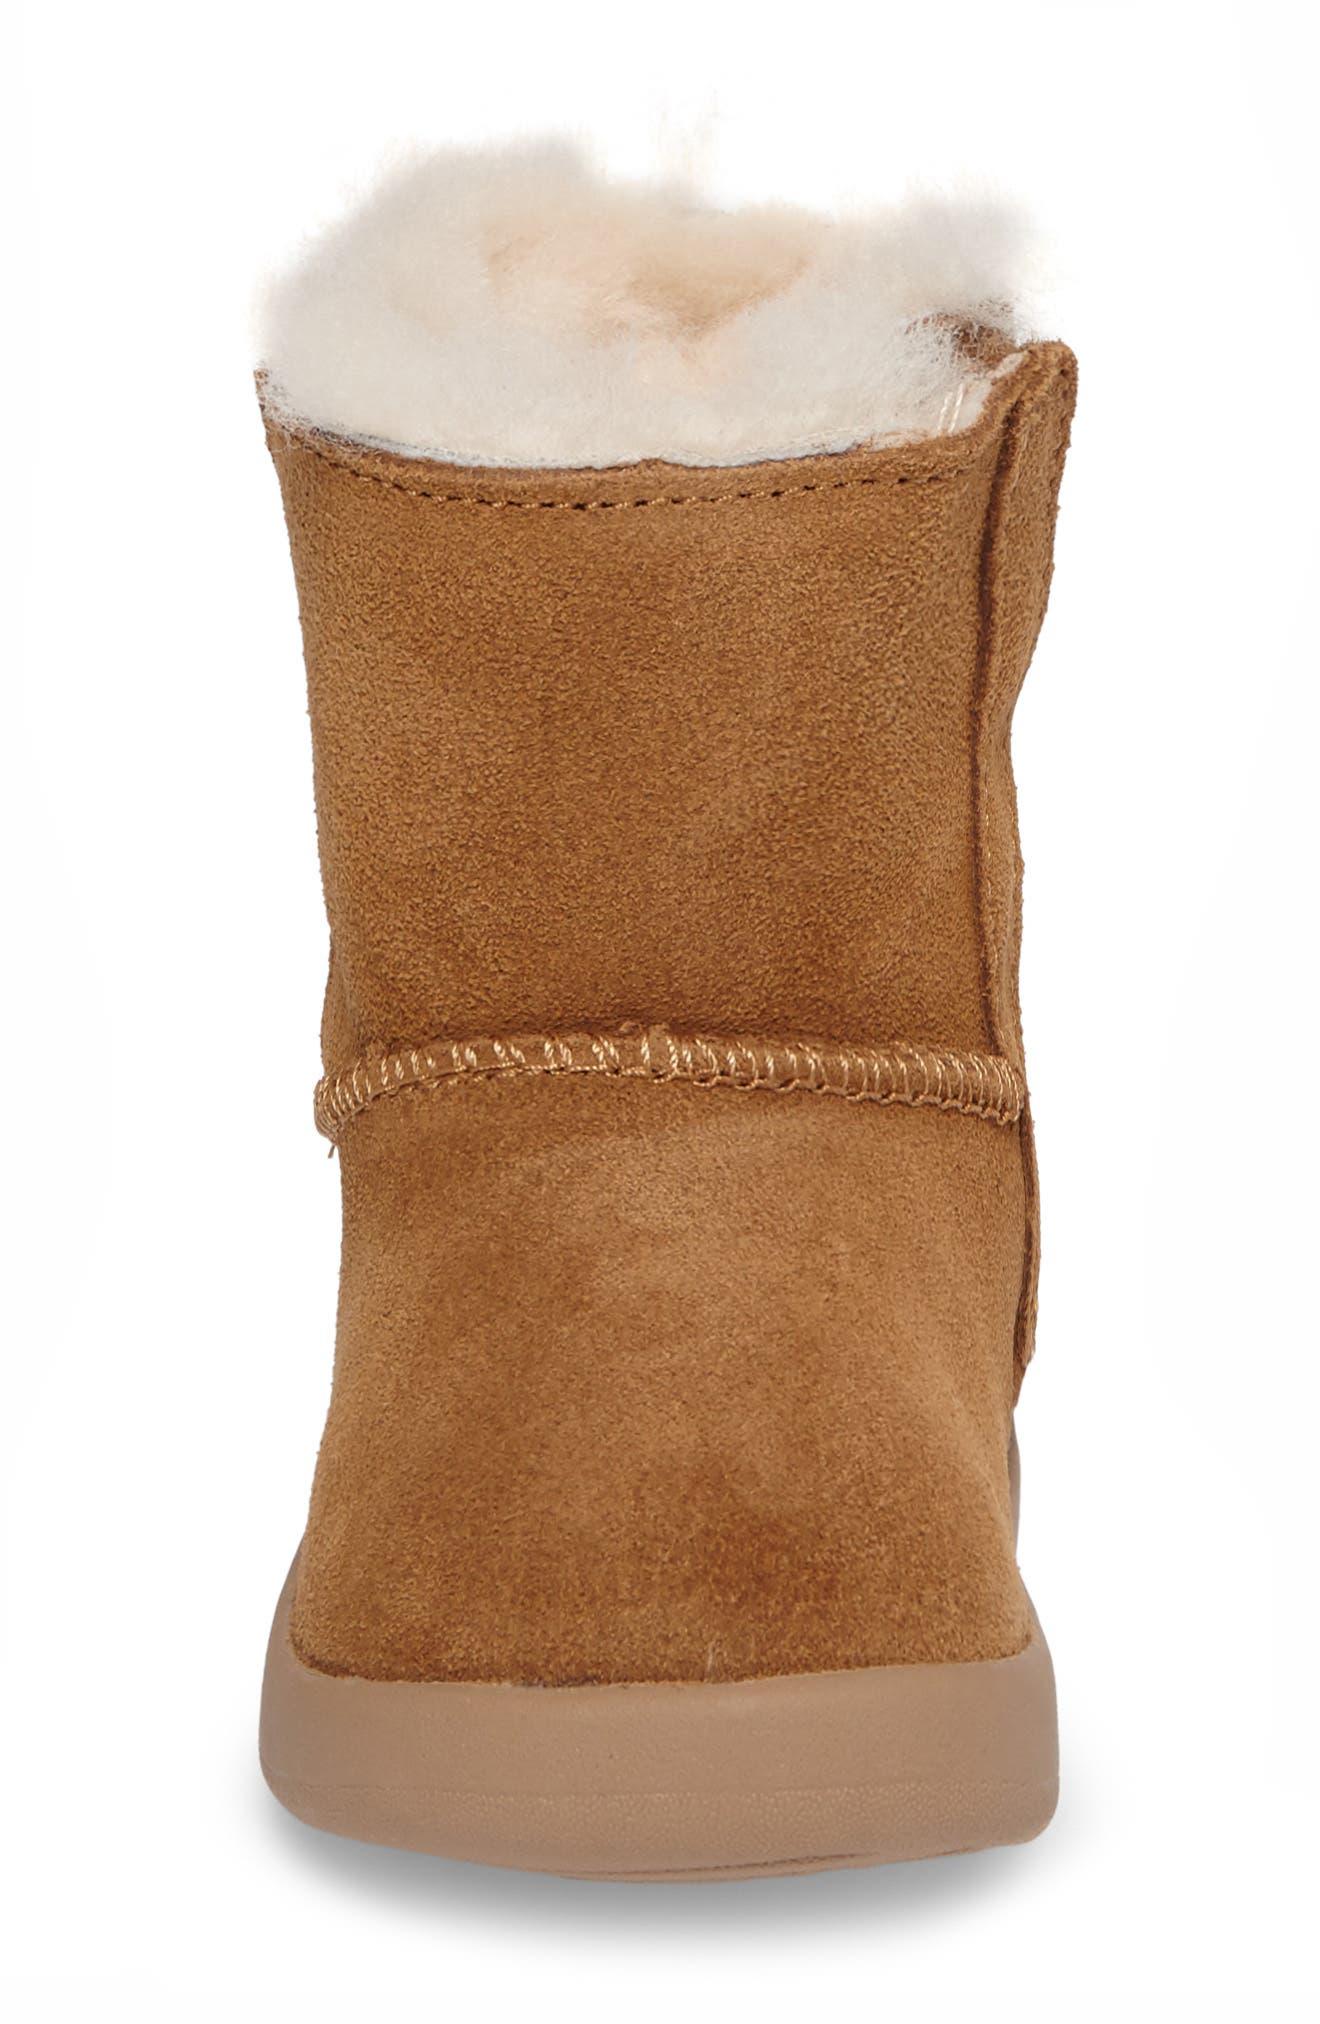 Keelan Genuine Shearling Baby Boot,                             Alternate thumbnail 4, color,                             CHESTNUT BROWN